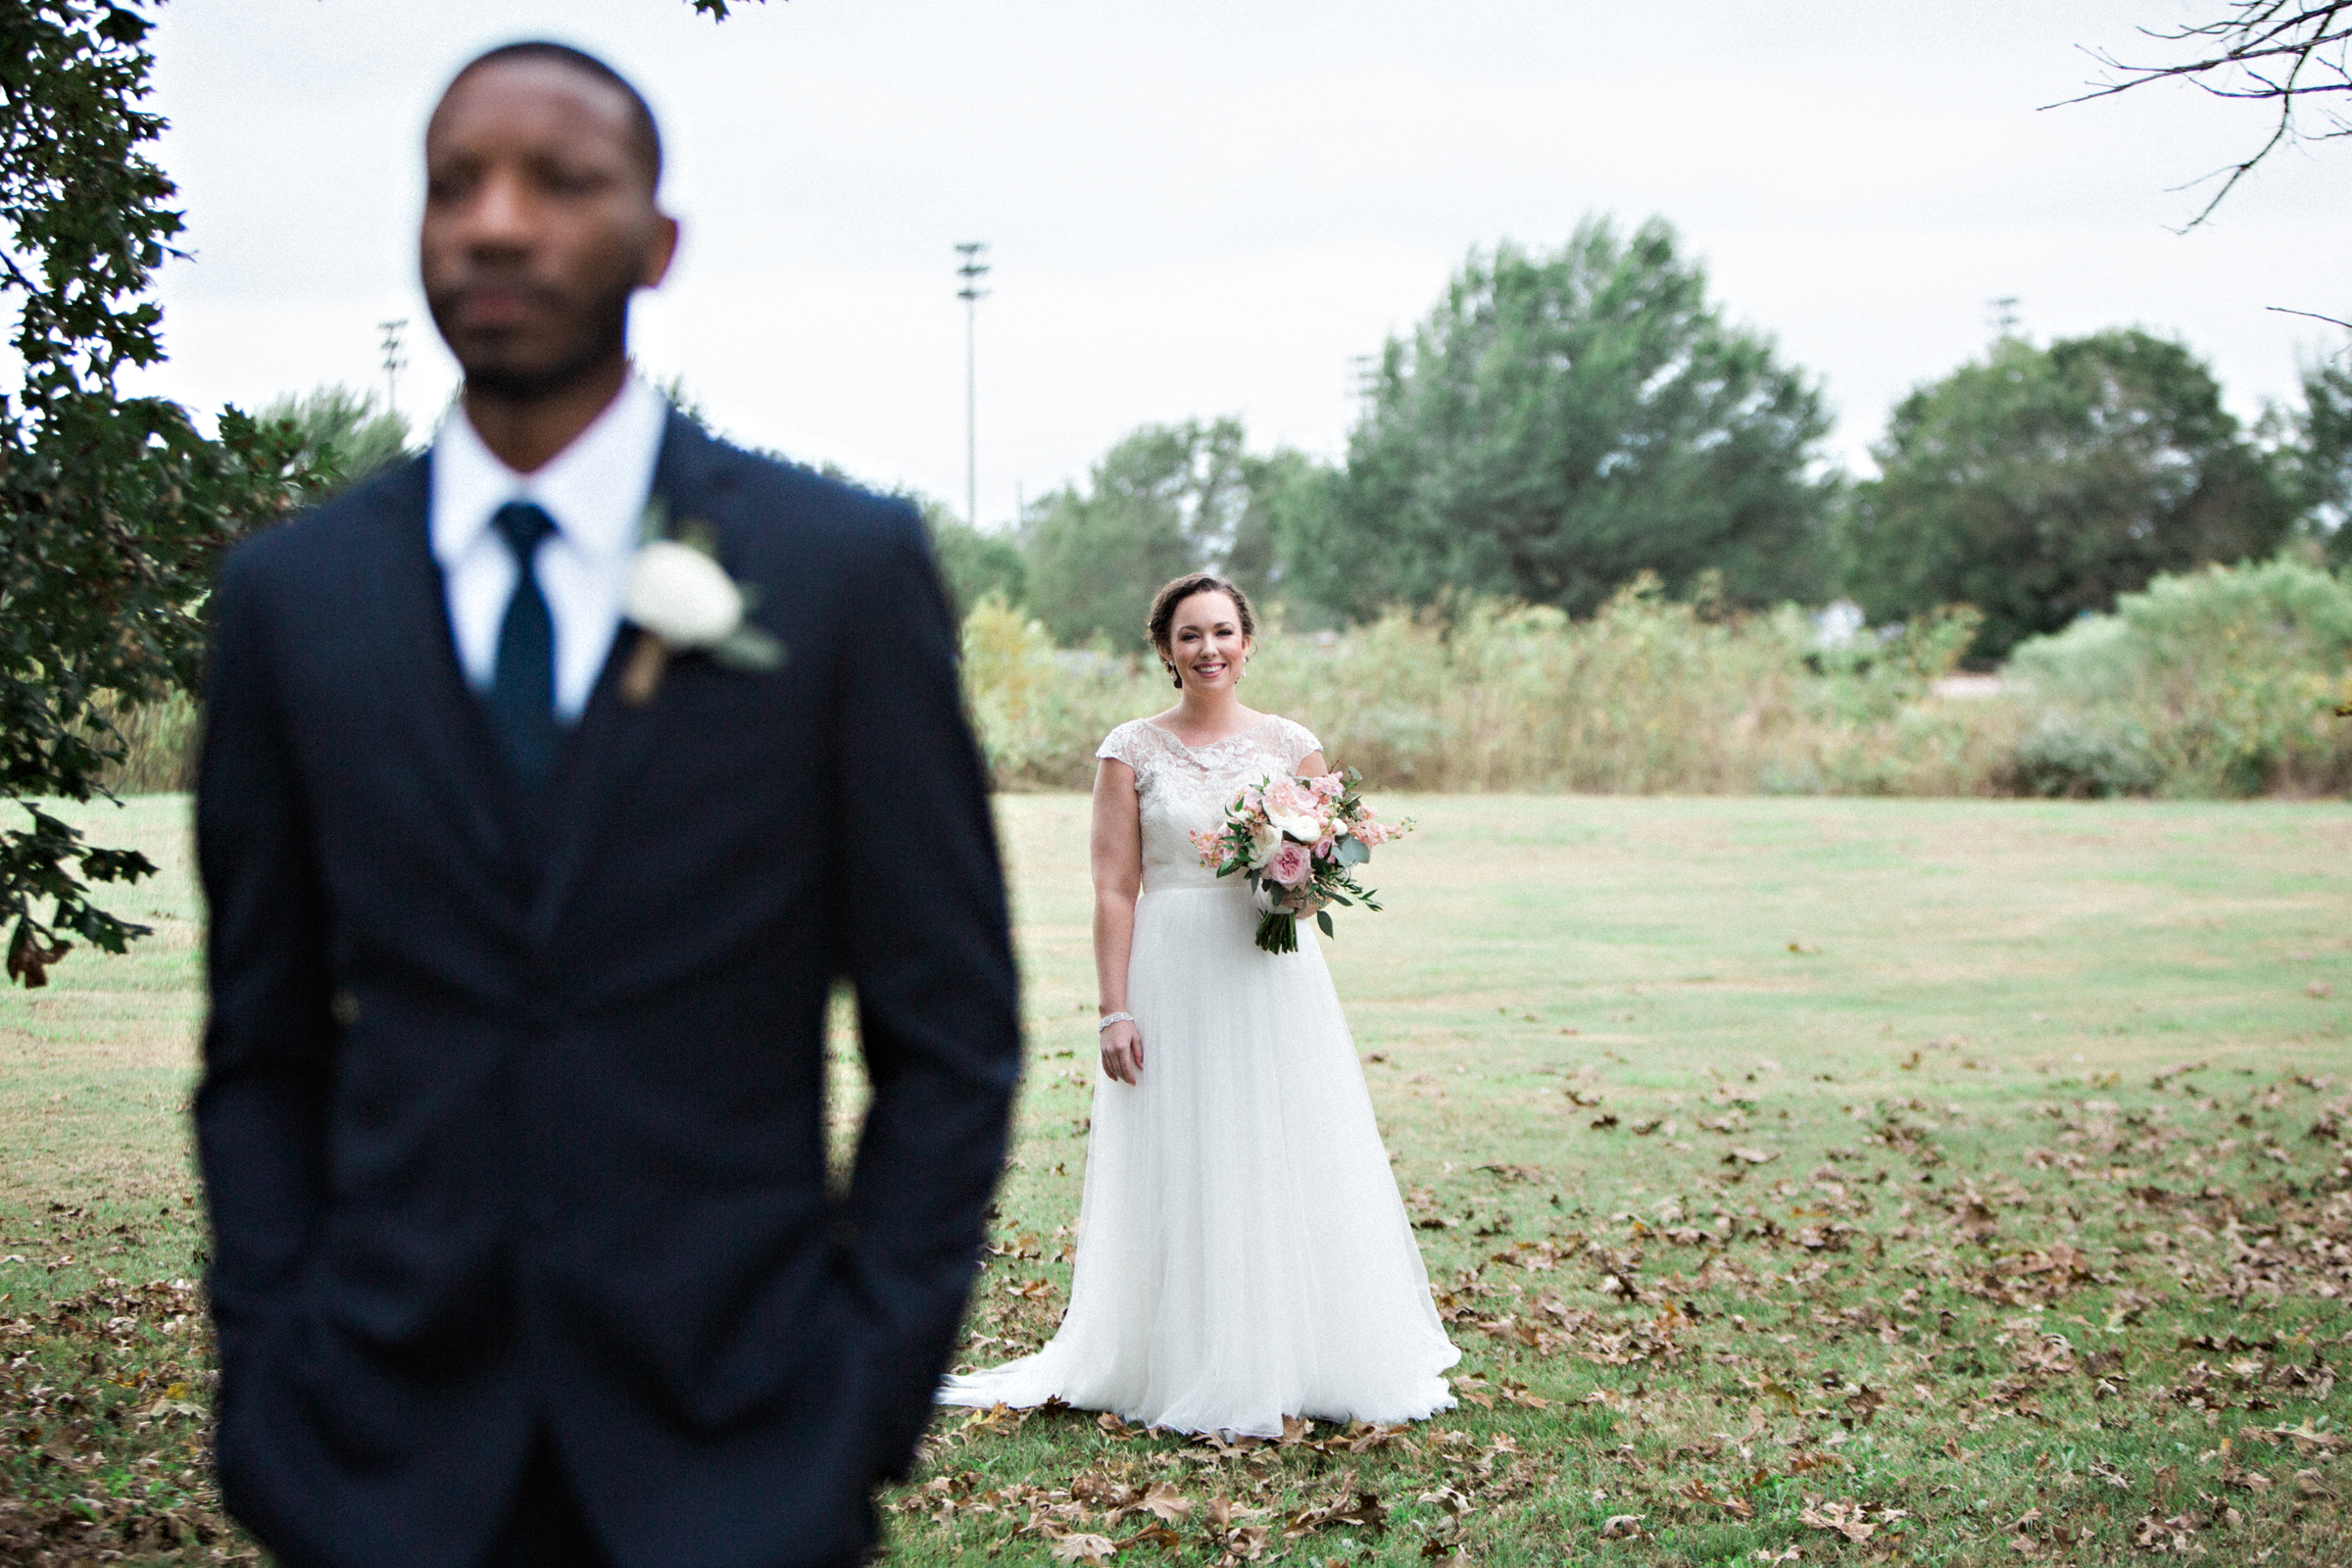 Alabama-Wedding-Photography-Nick-Drollette-Cory-Laura-116.jpg